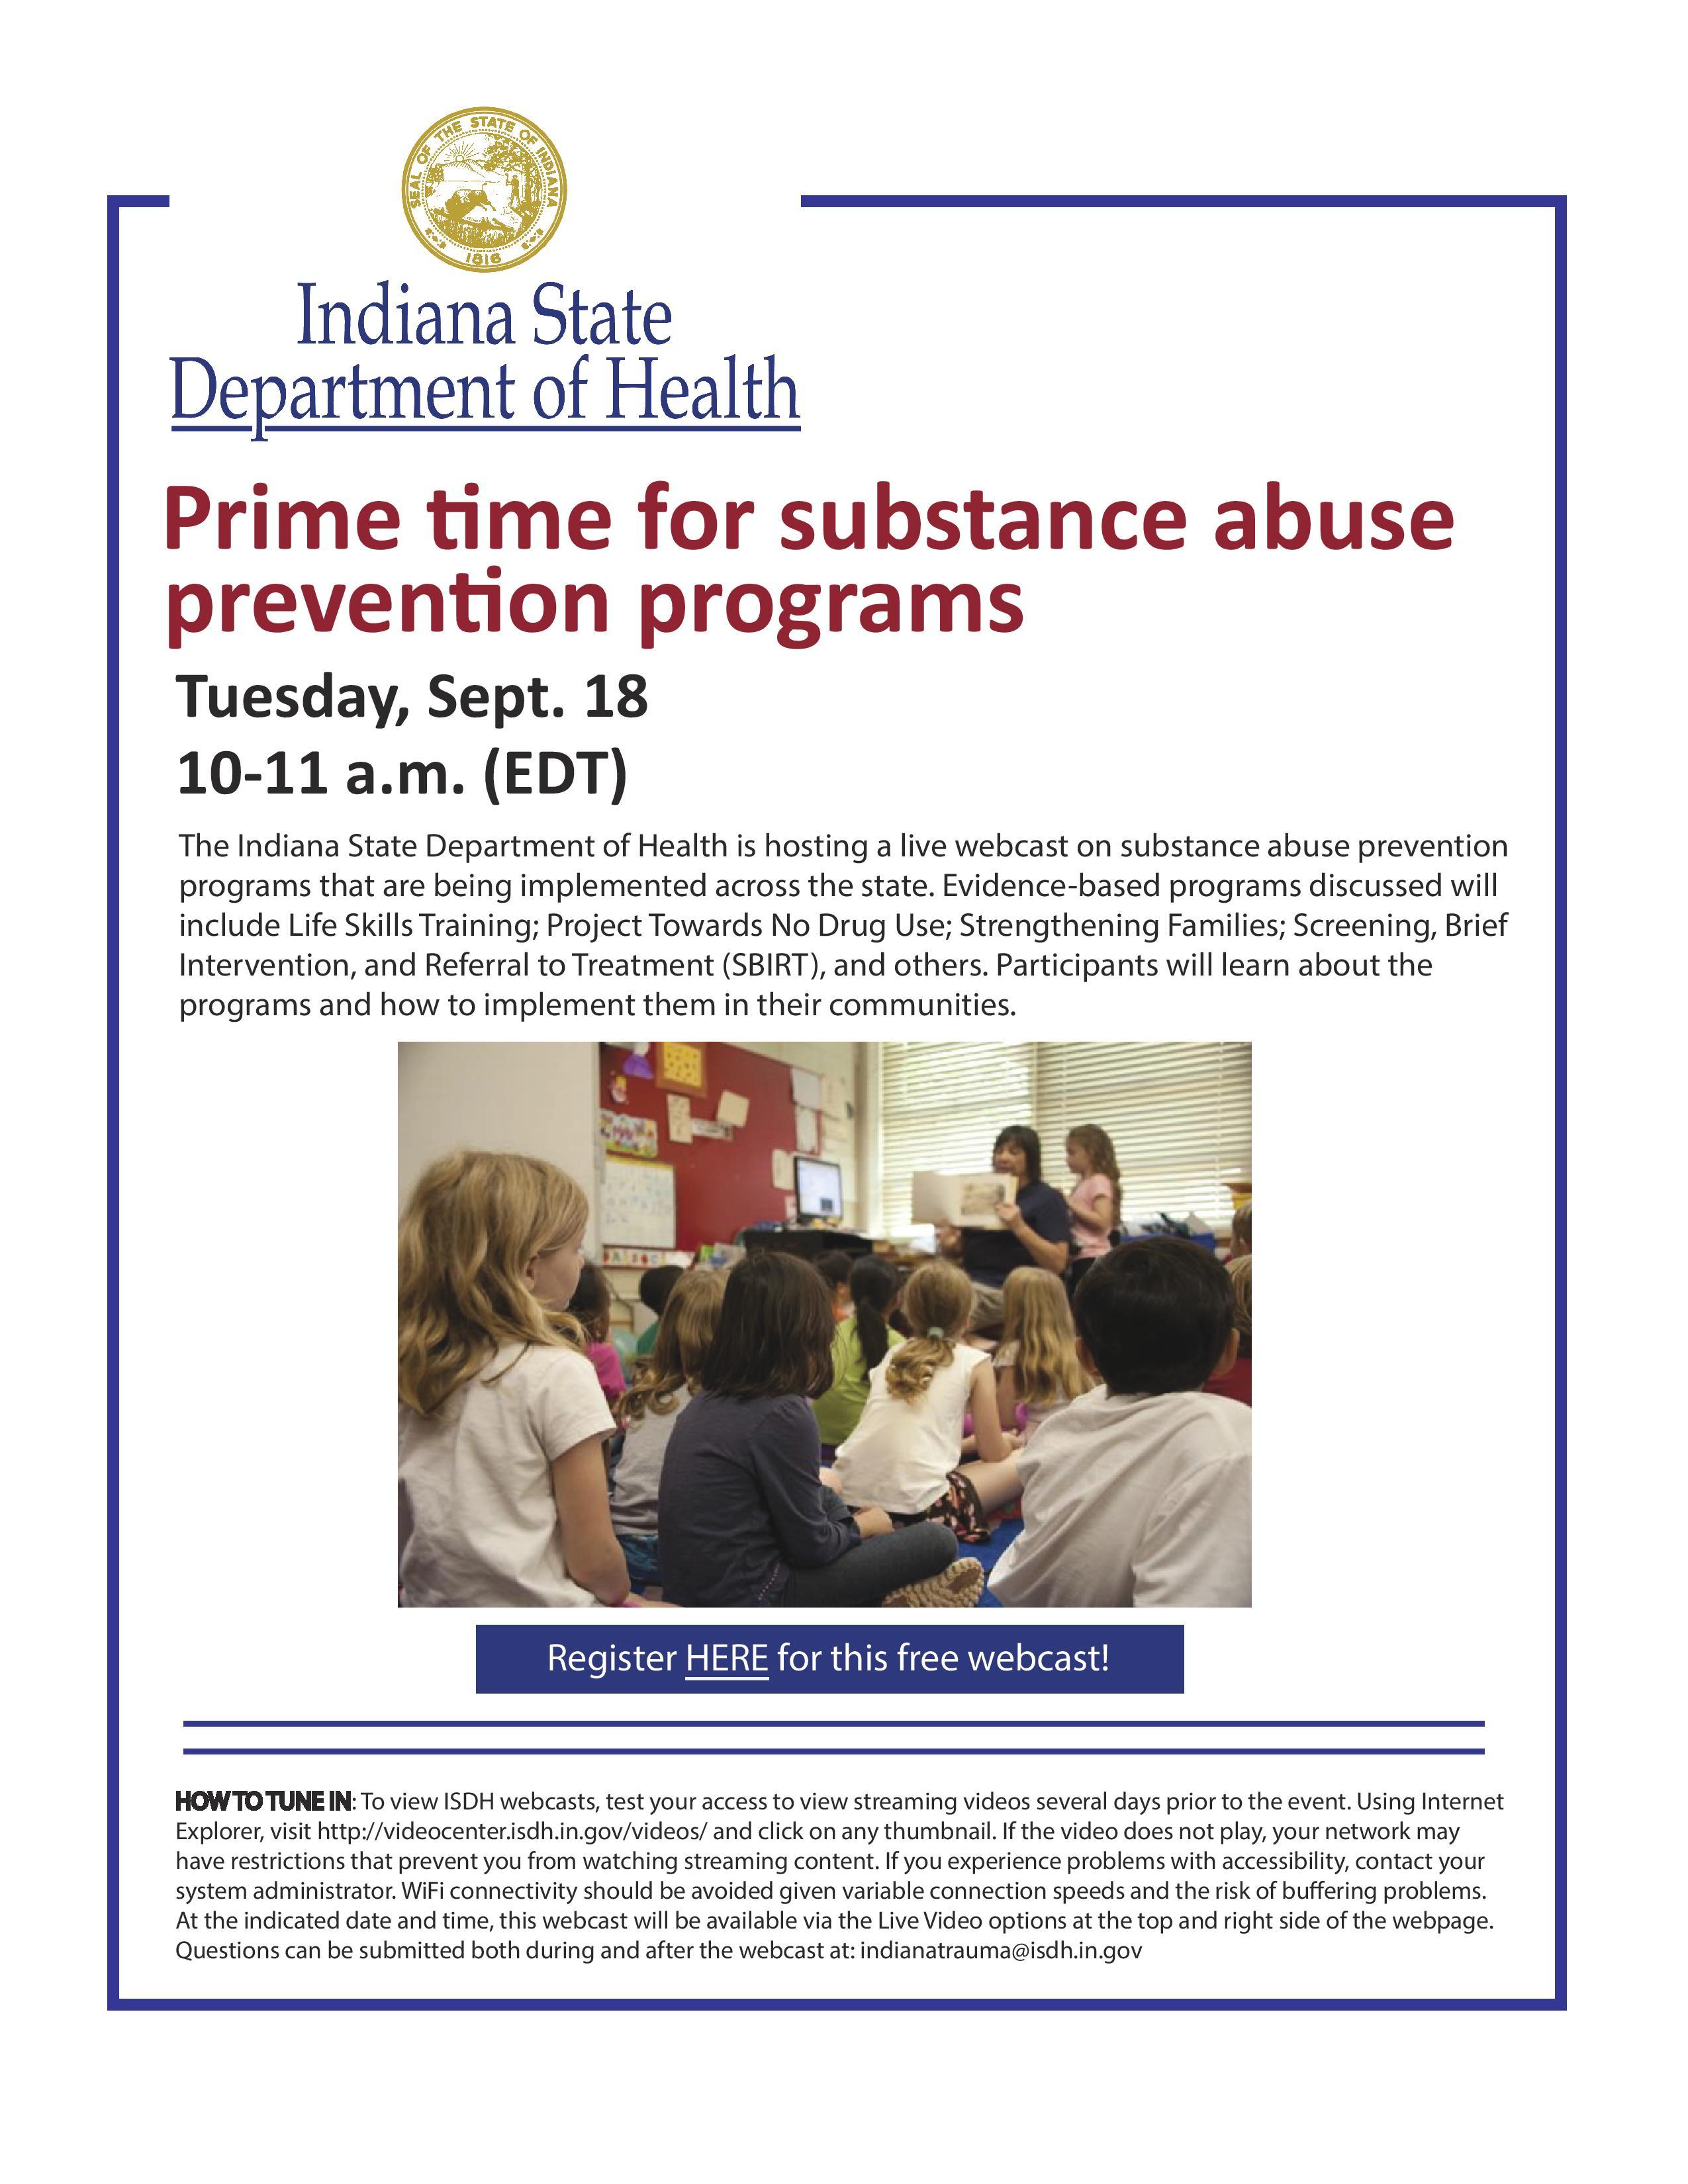 ISDH prevention programs webcast